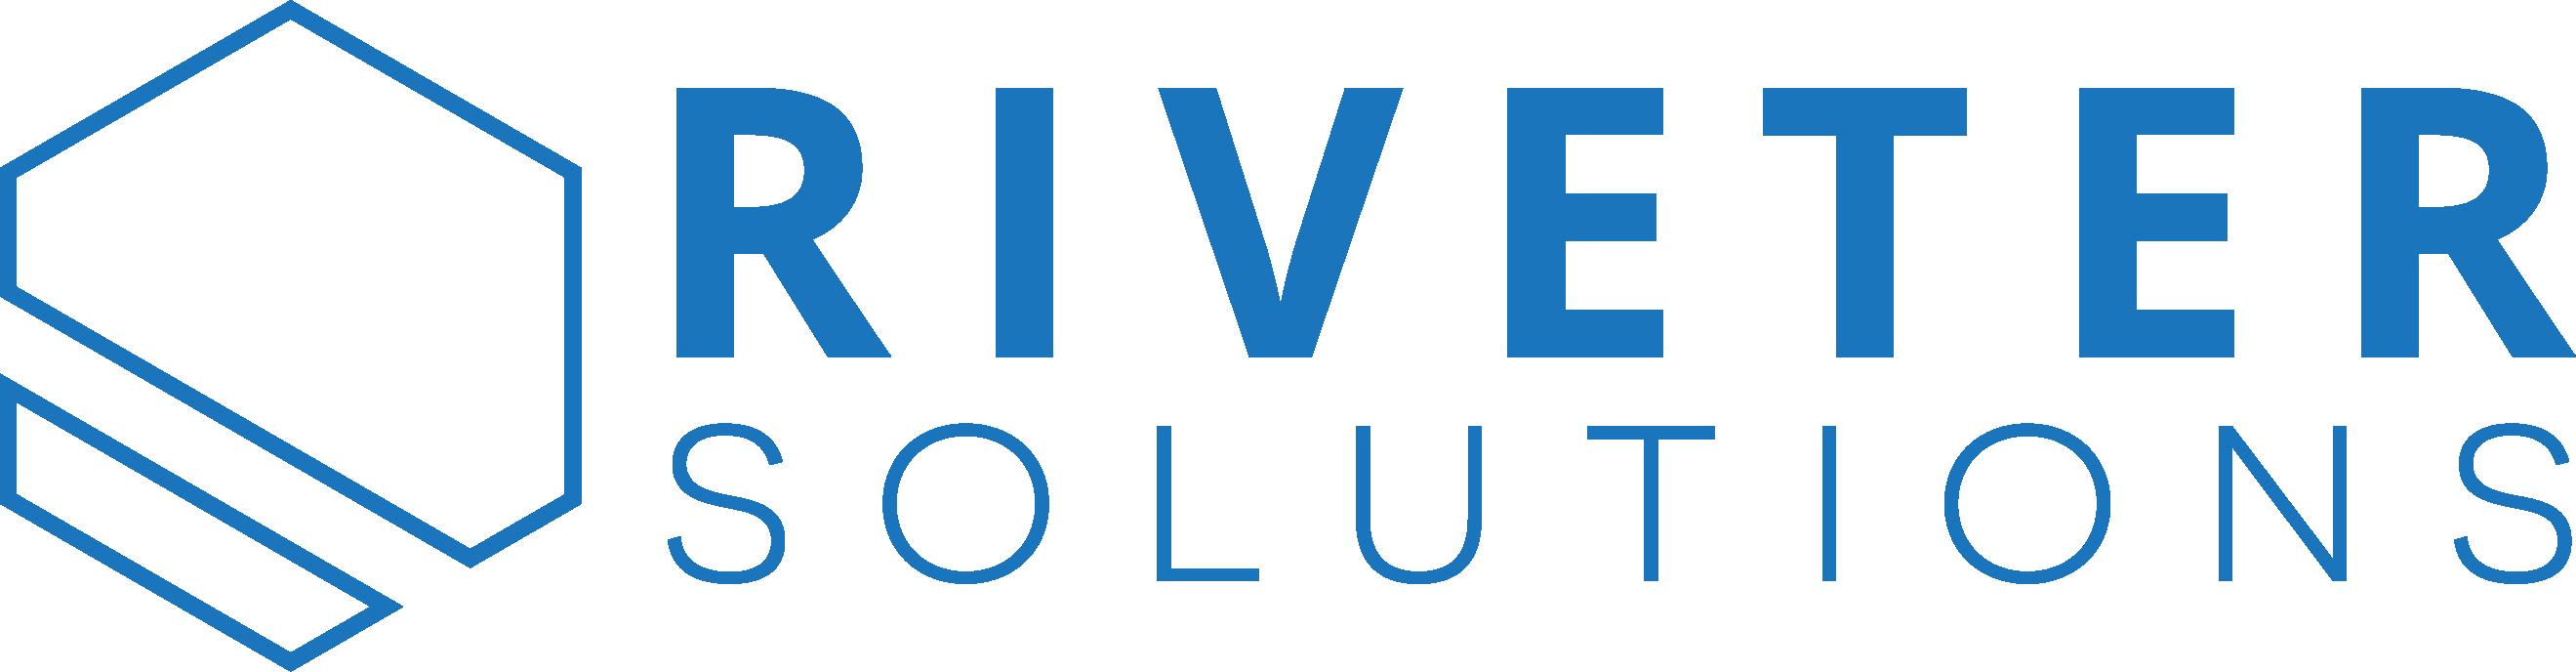 Riveter Solutions